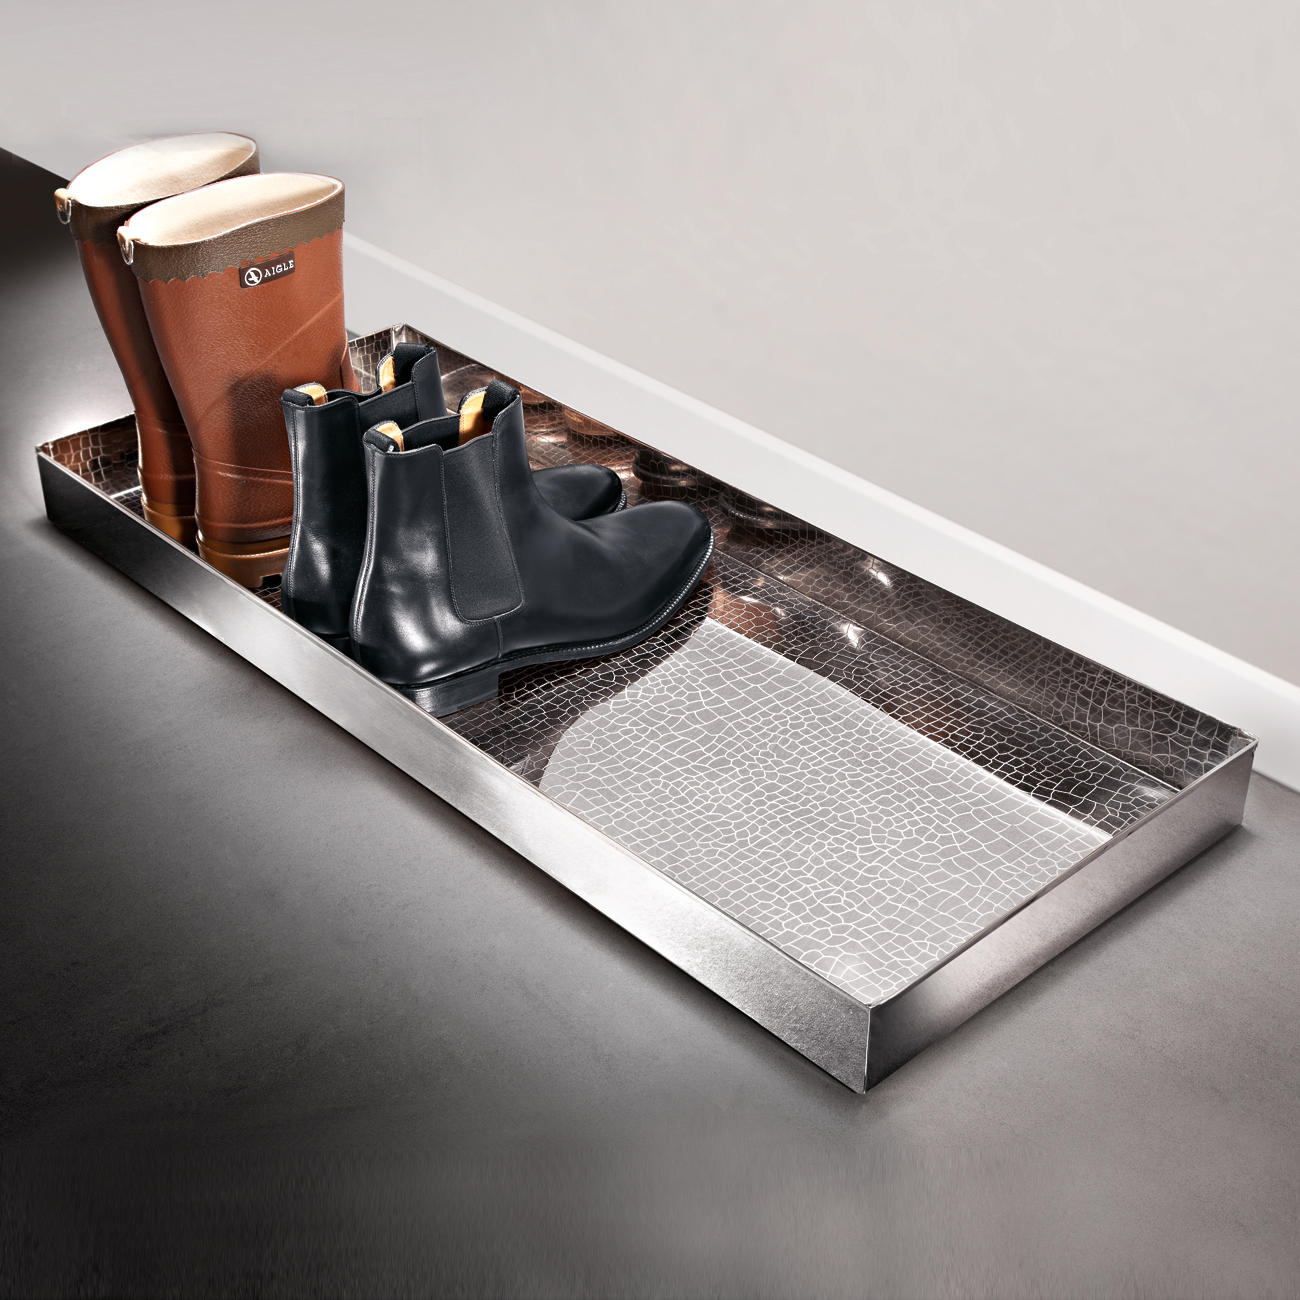 Buy Alligator Boot Tray 3 year Product Guarantee